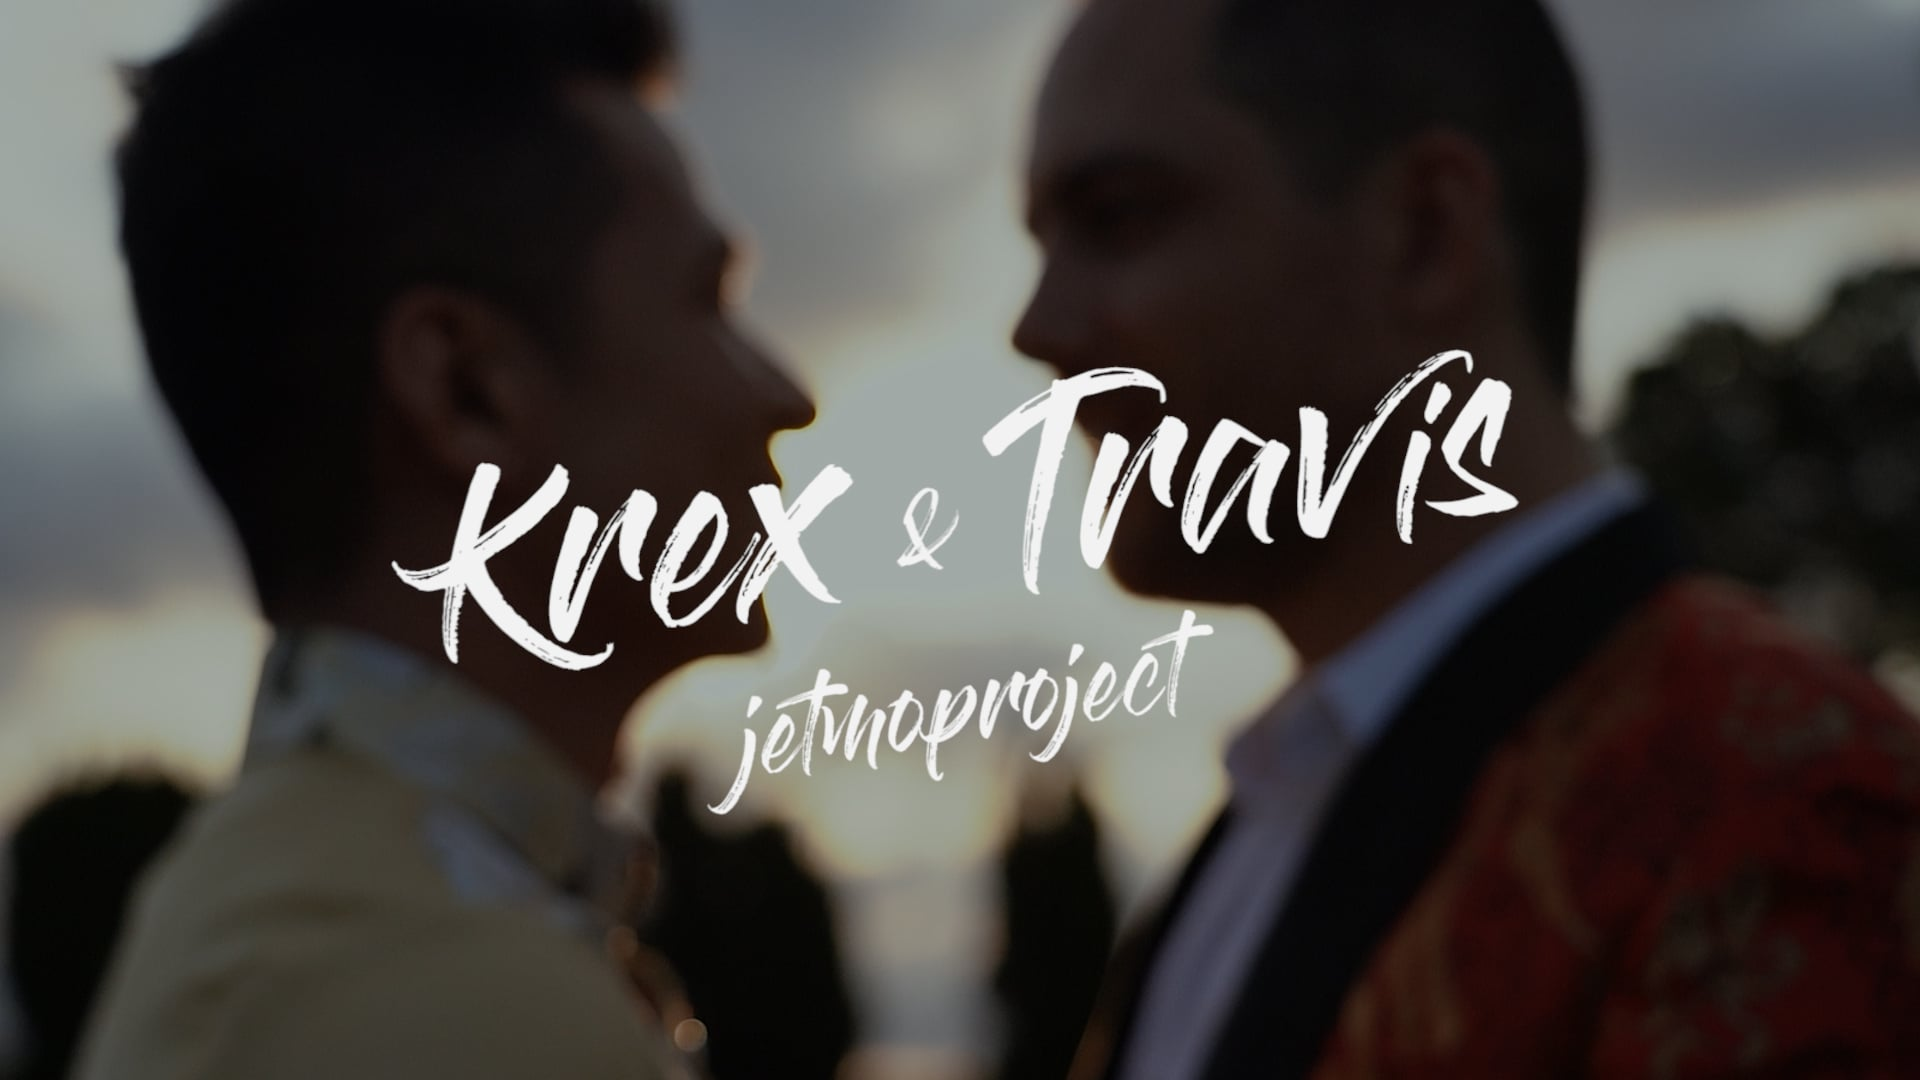 Krex & Travis